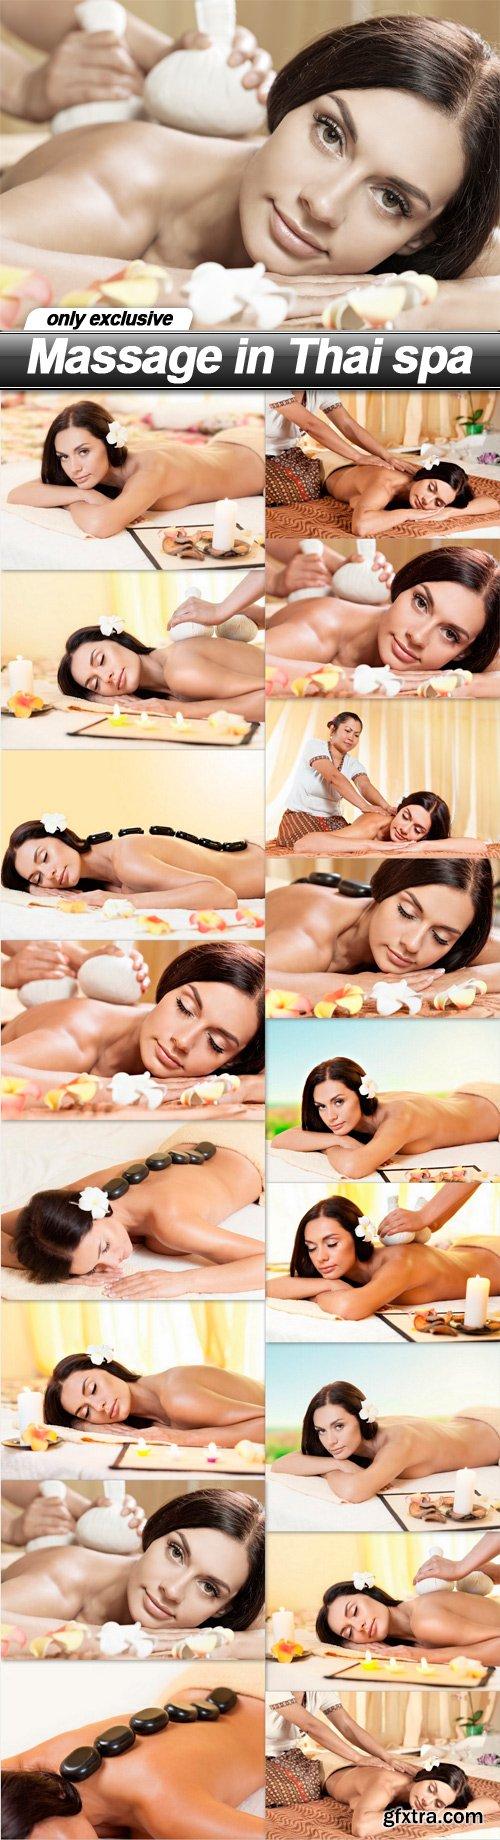 Massage in Thai spa - 17 UHQ JPEG